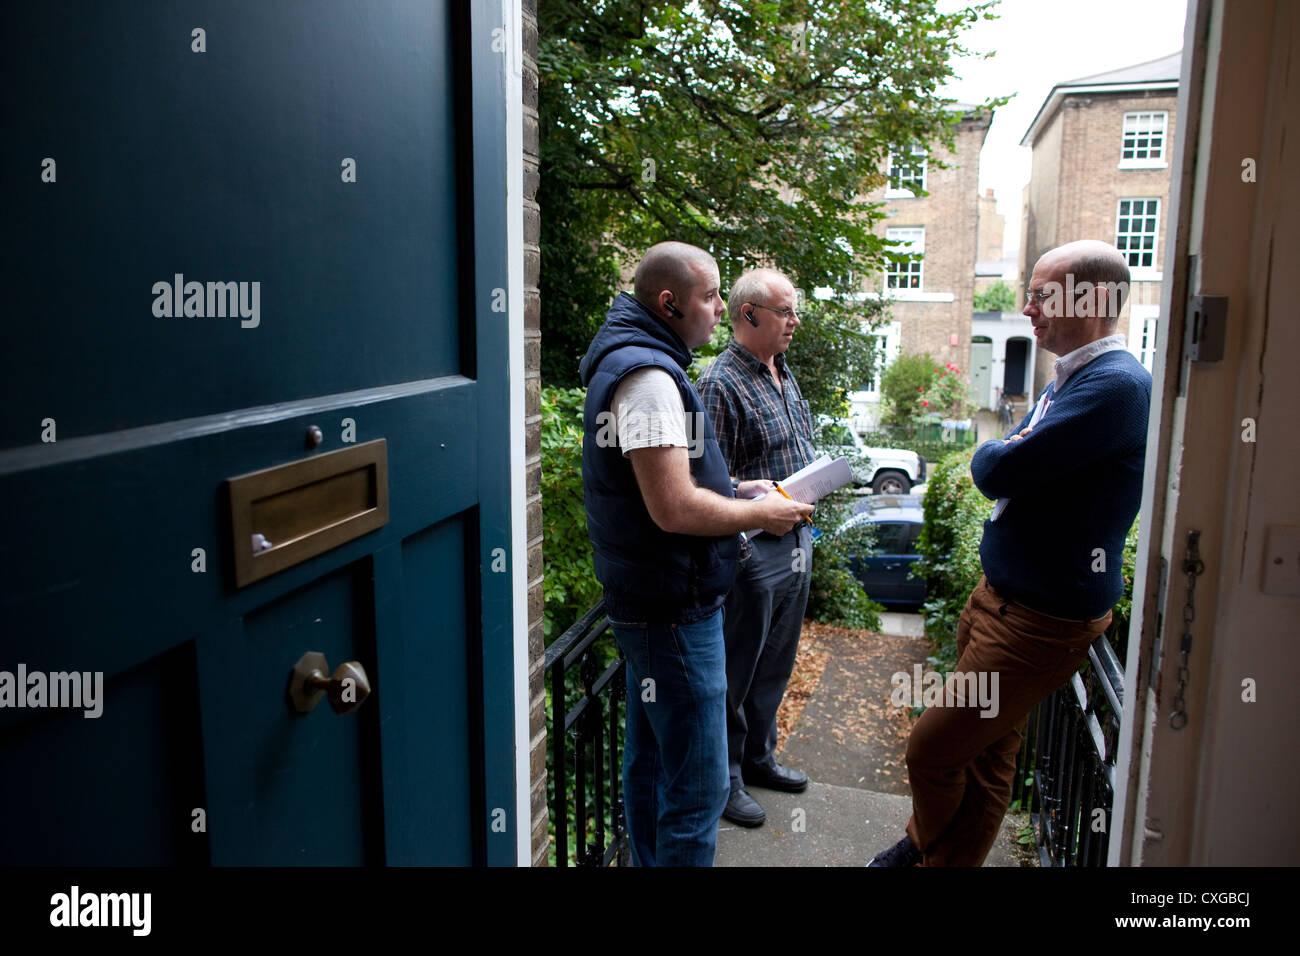 Bailiffs outside a residential address in London, UK - Stock Image